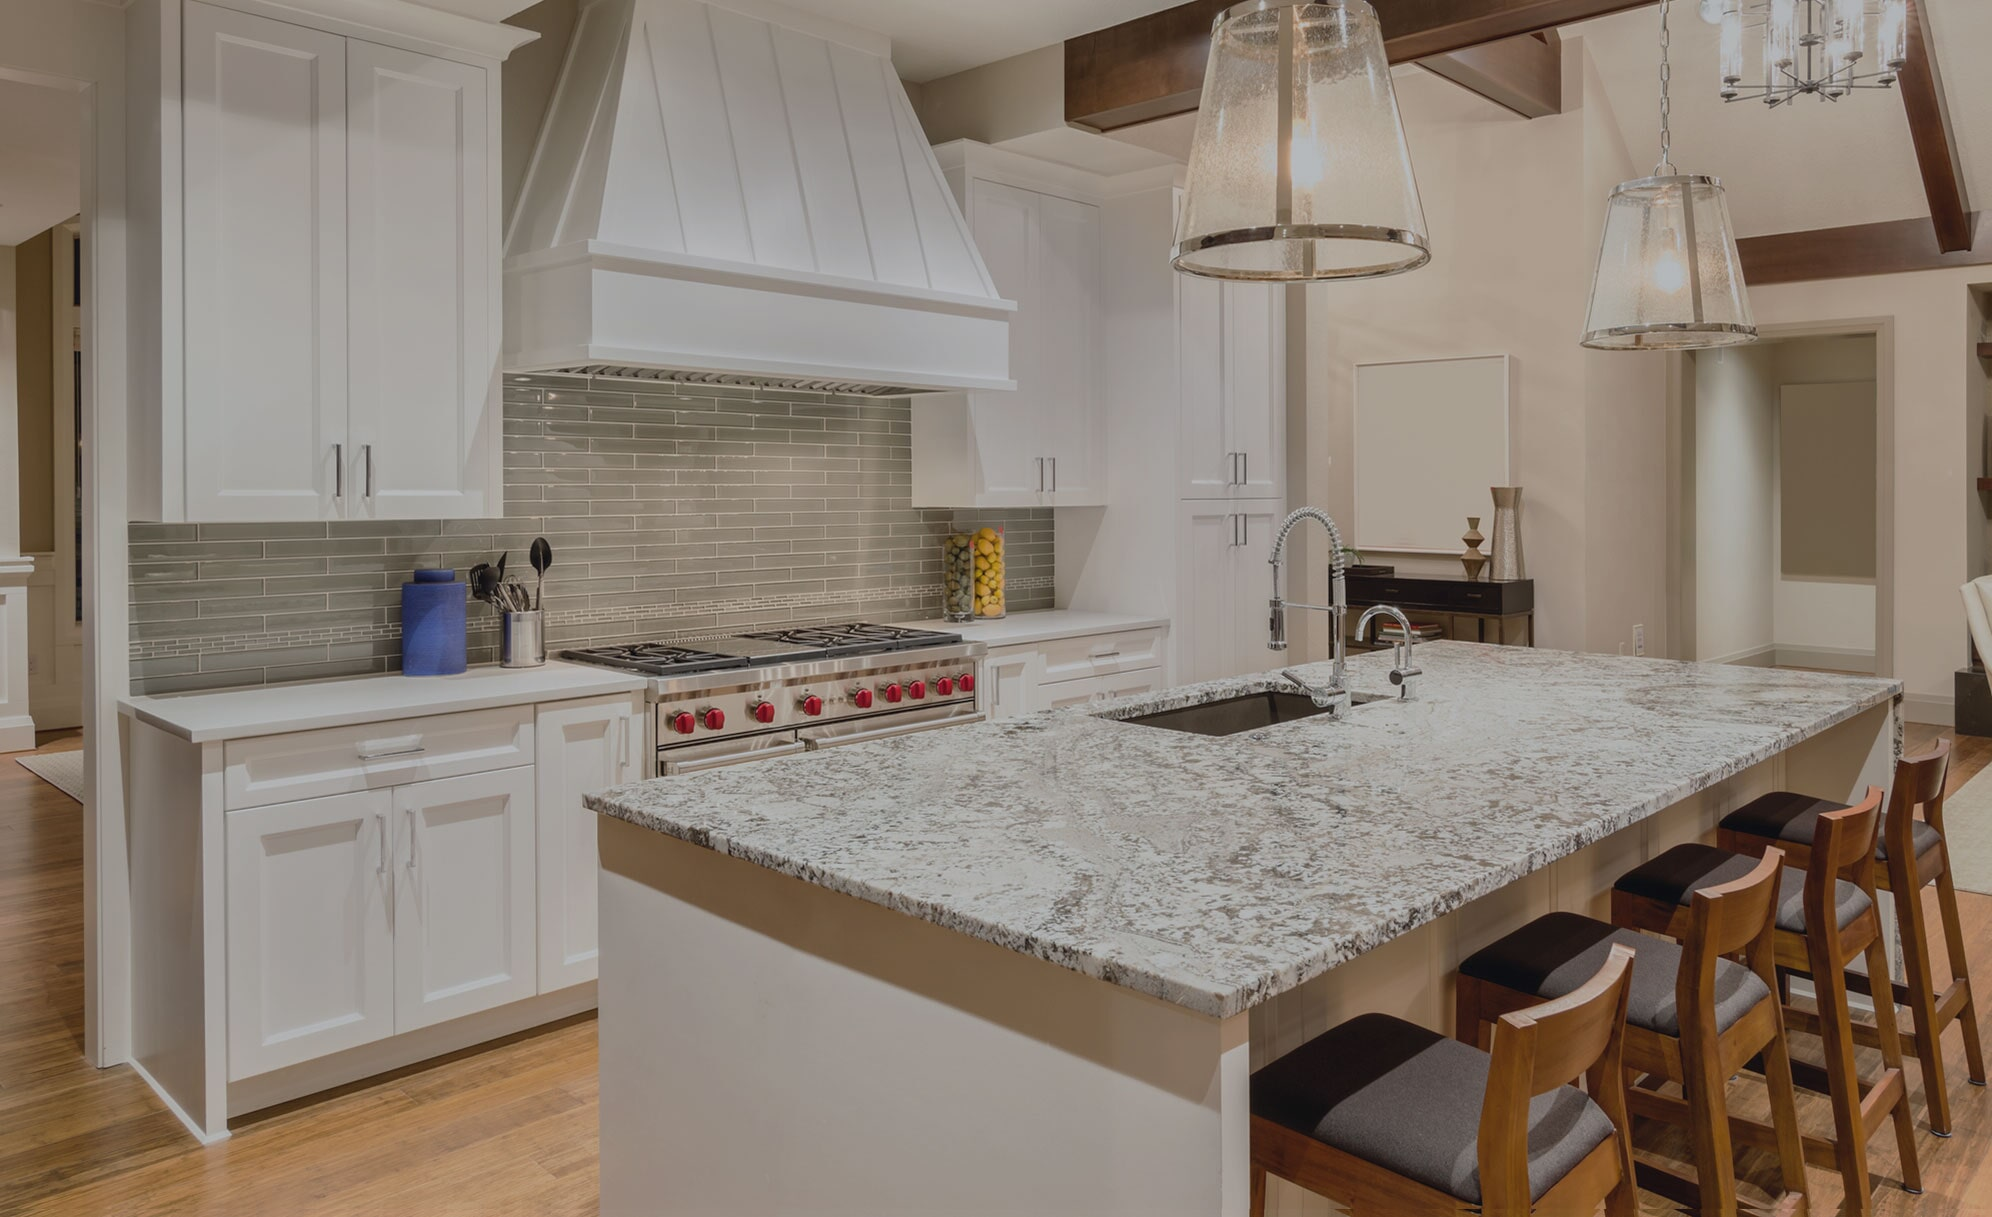 marble web restoration fl by naples inc countertops reina dsc executivewebchoice kitchen jorge com granite